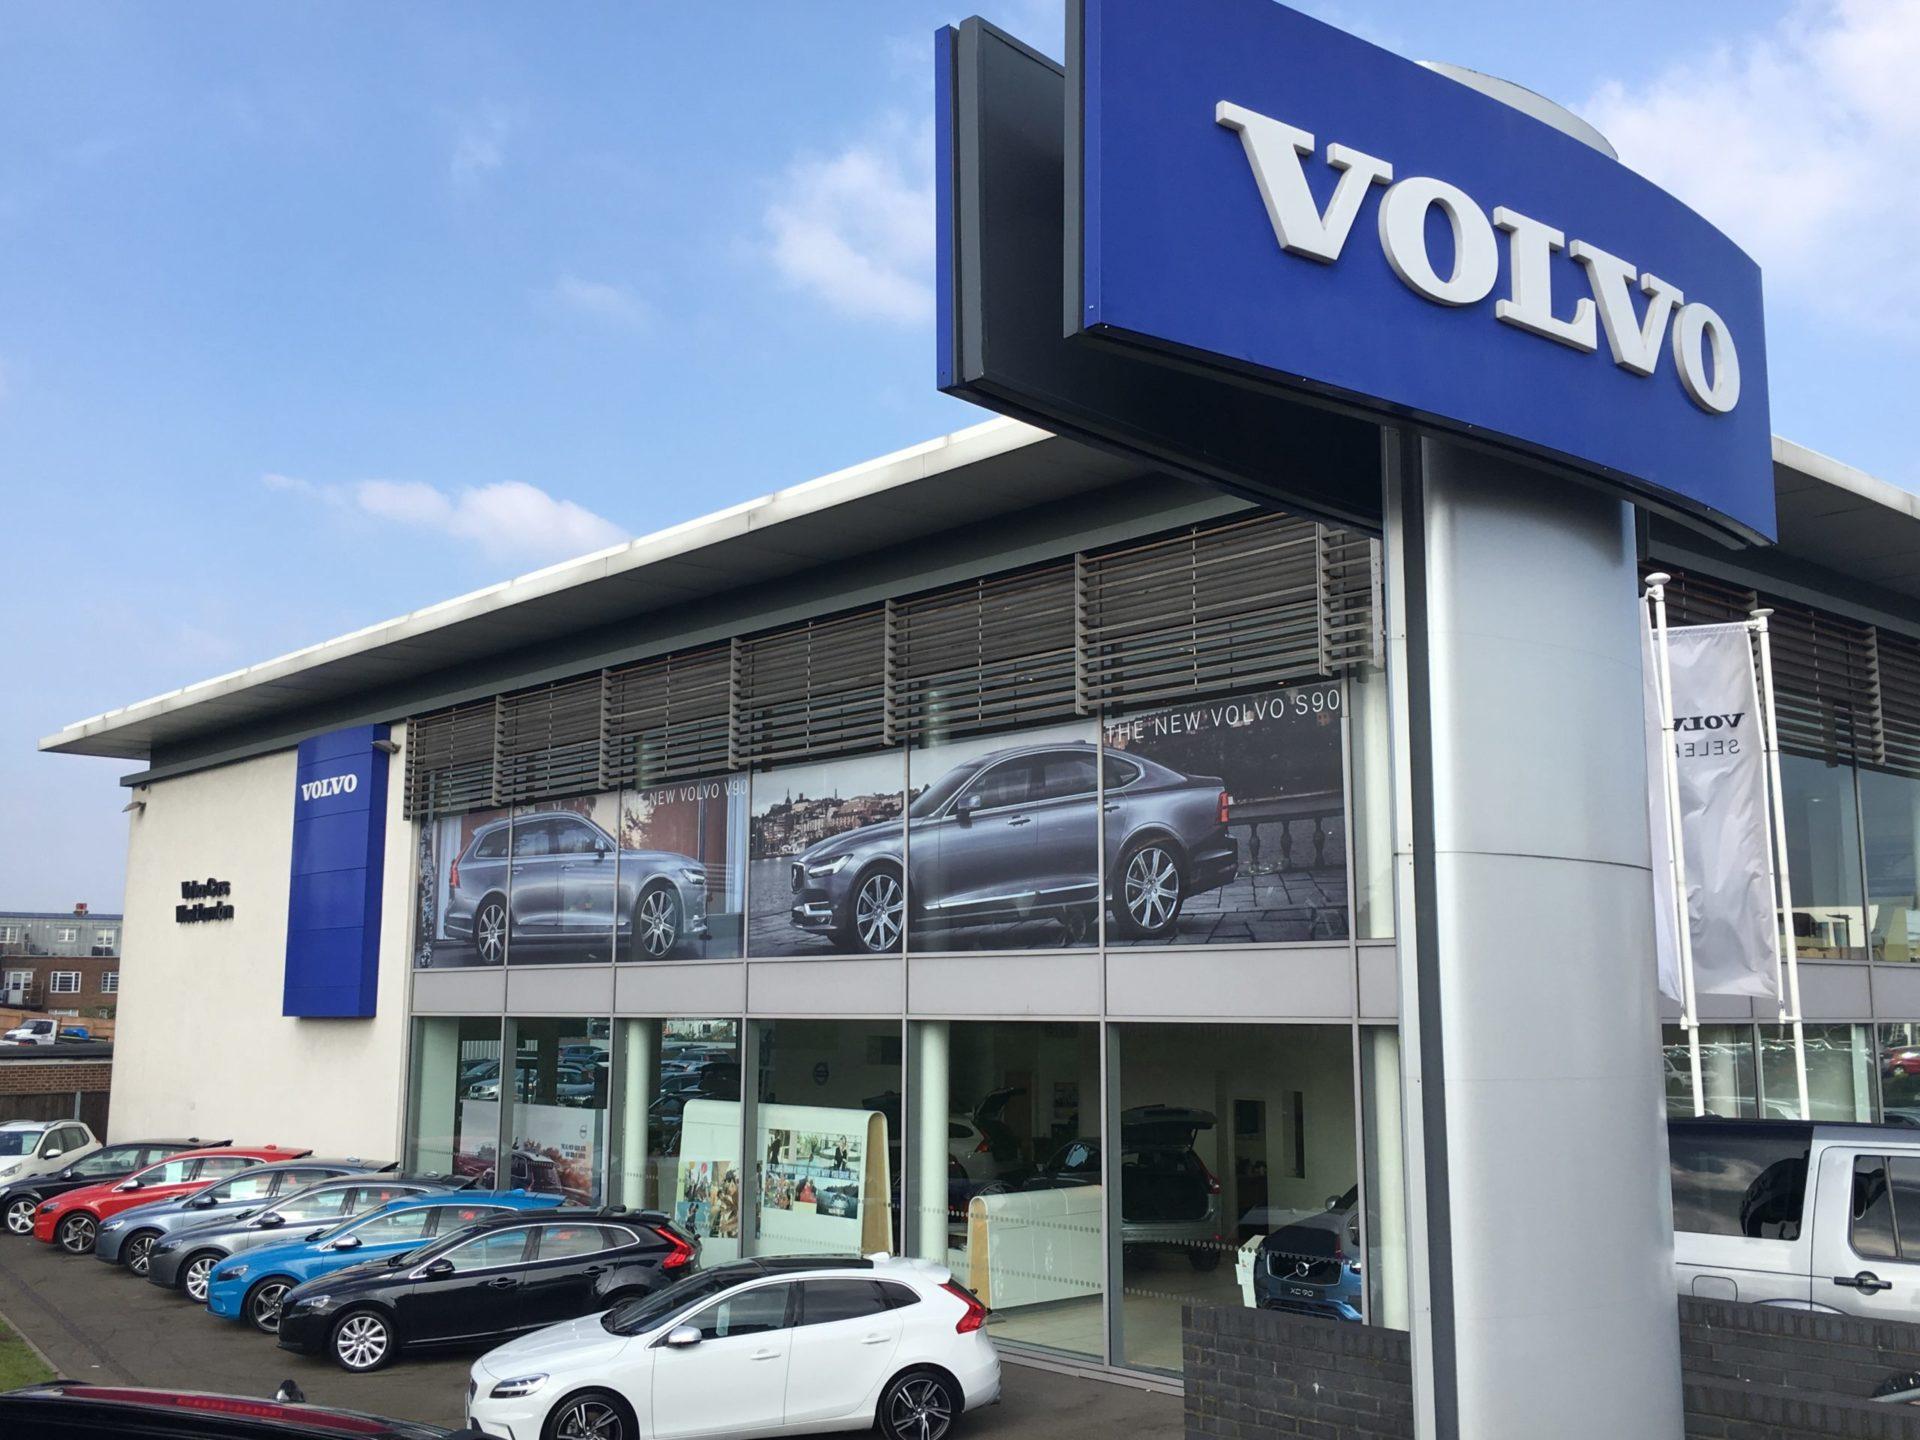 volvo-showroom-highlight-see-through-window-graphics